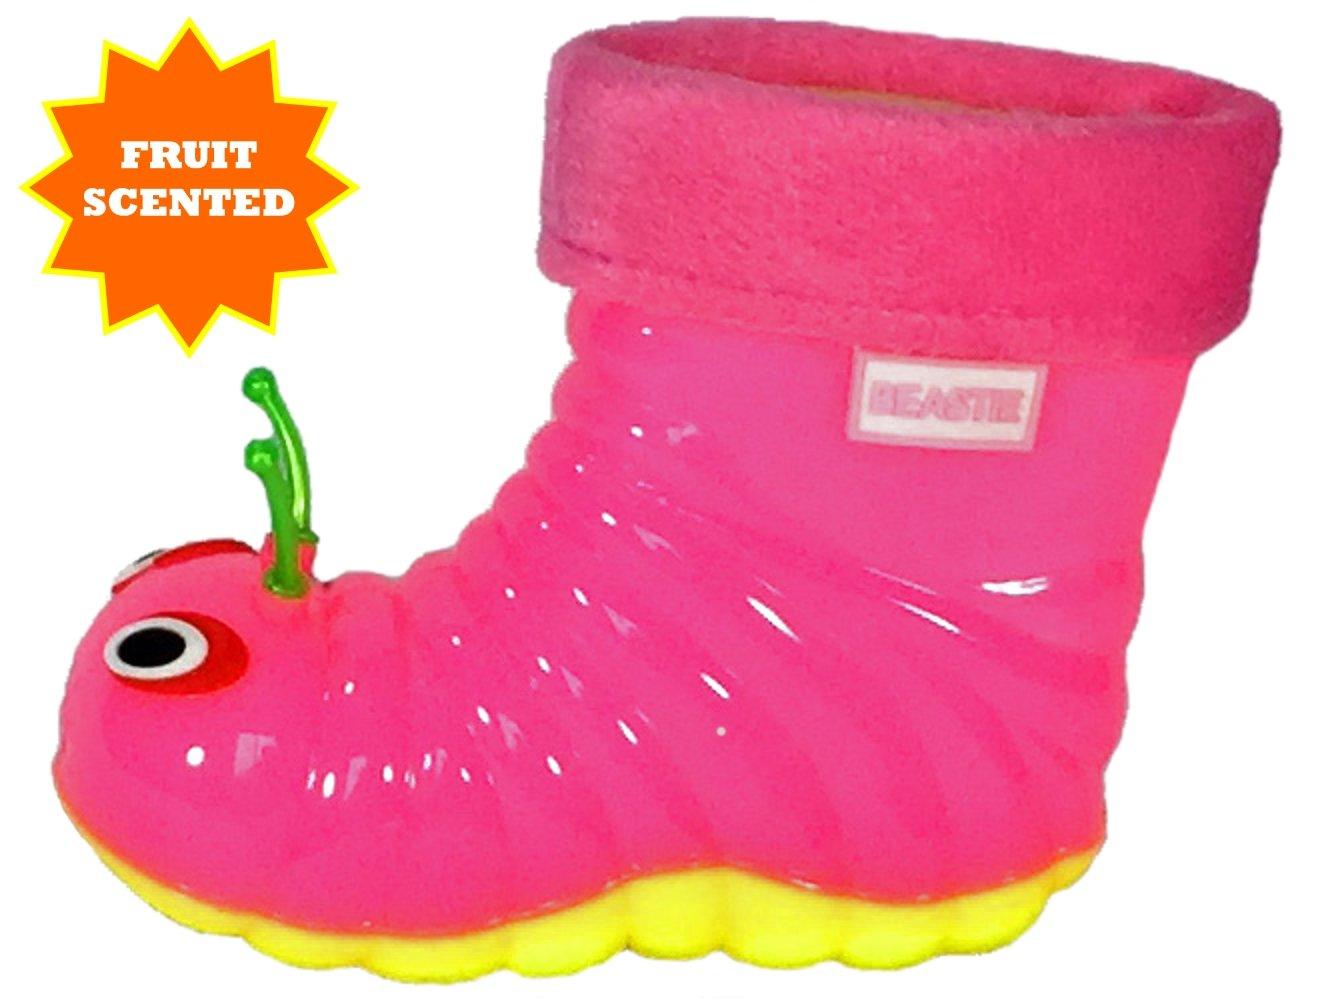 Children's Waterproof Rain Boots Cartoon Animals Toddler/Little Kid (28 (10 M US Toddler), Pink) by Beastie Shoes (Image #4)